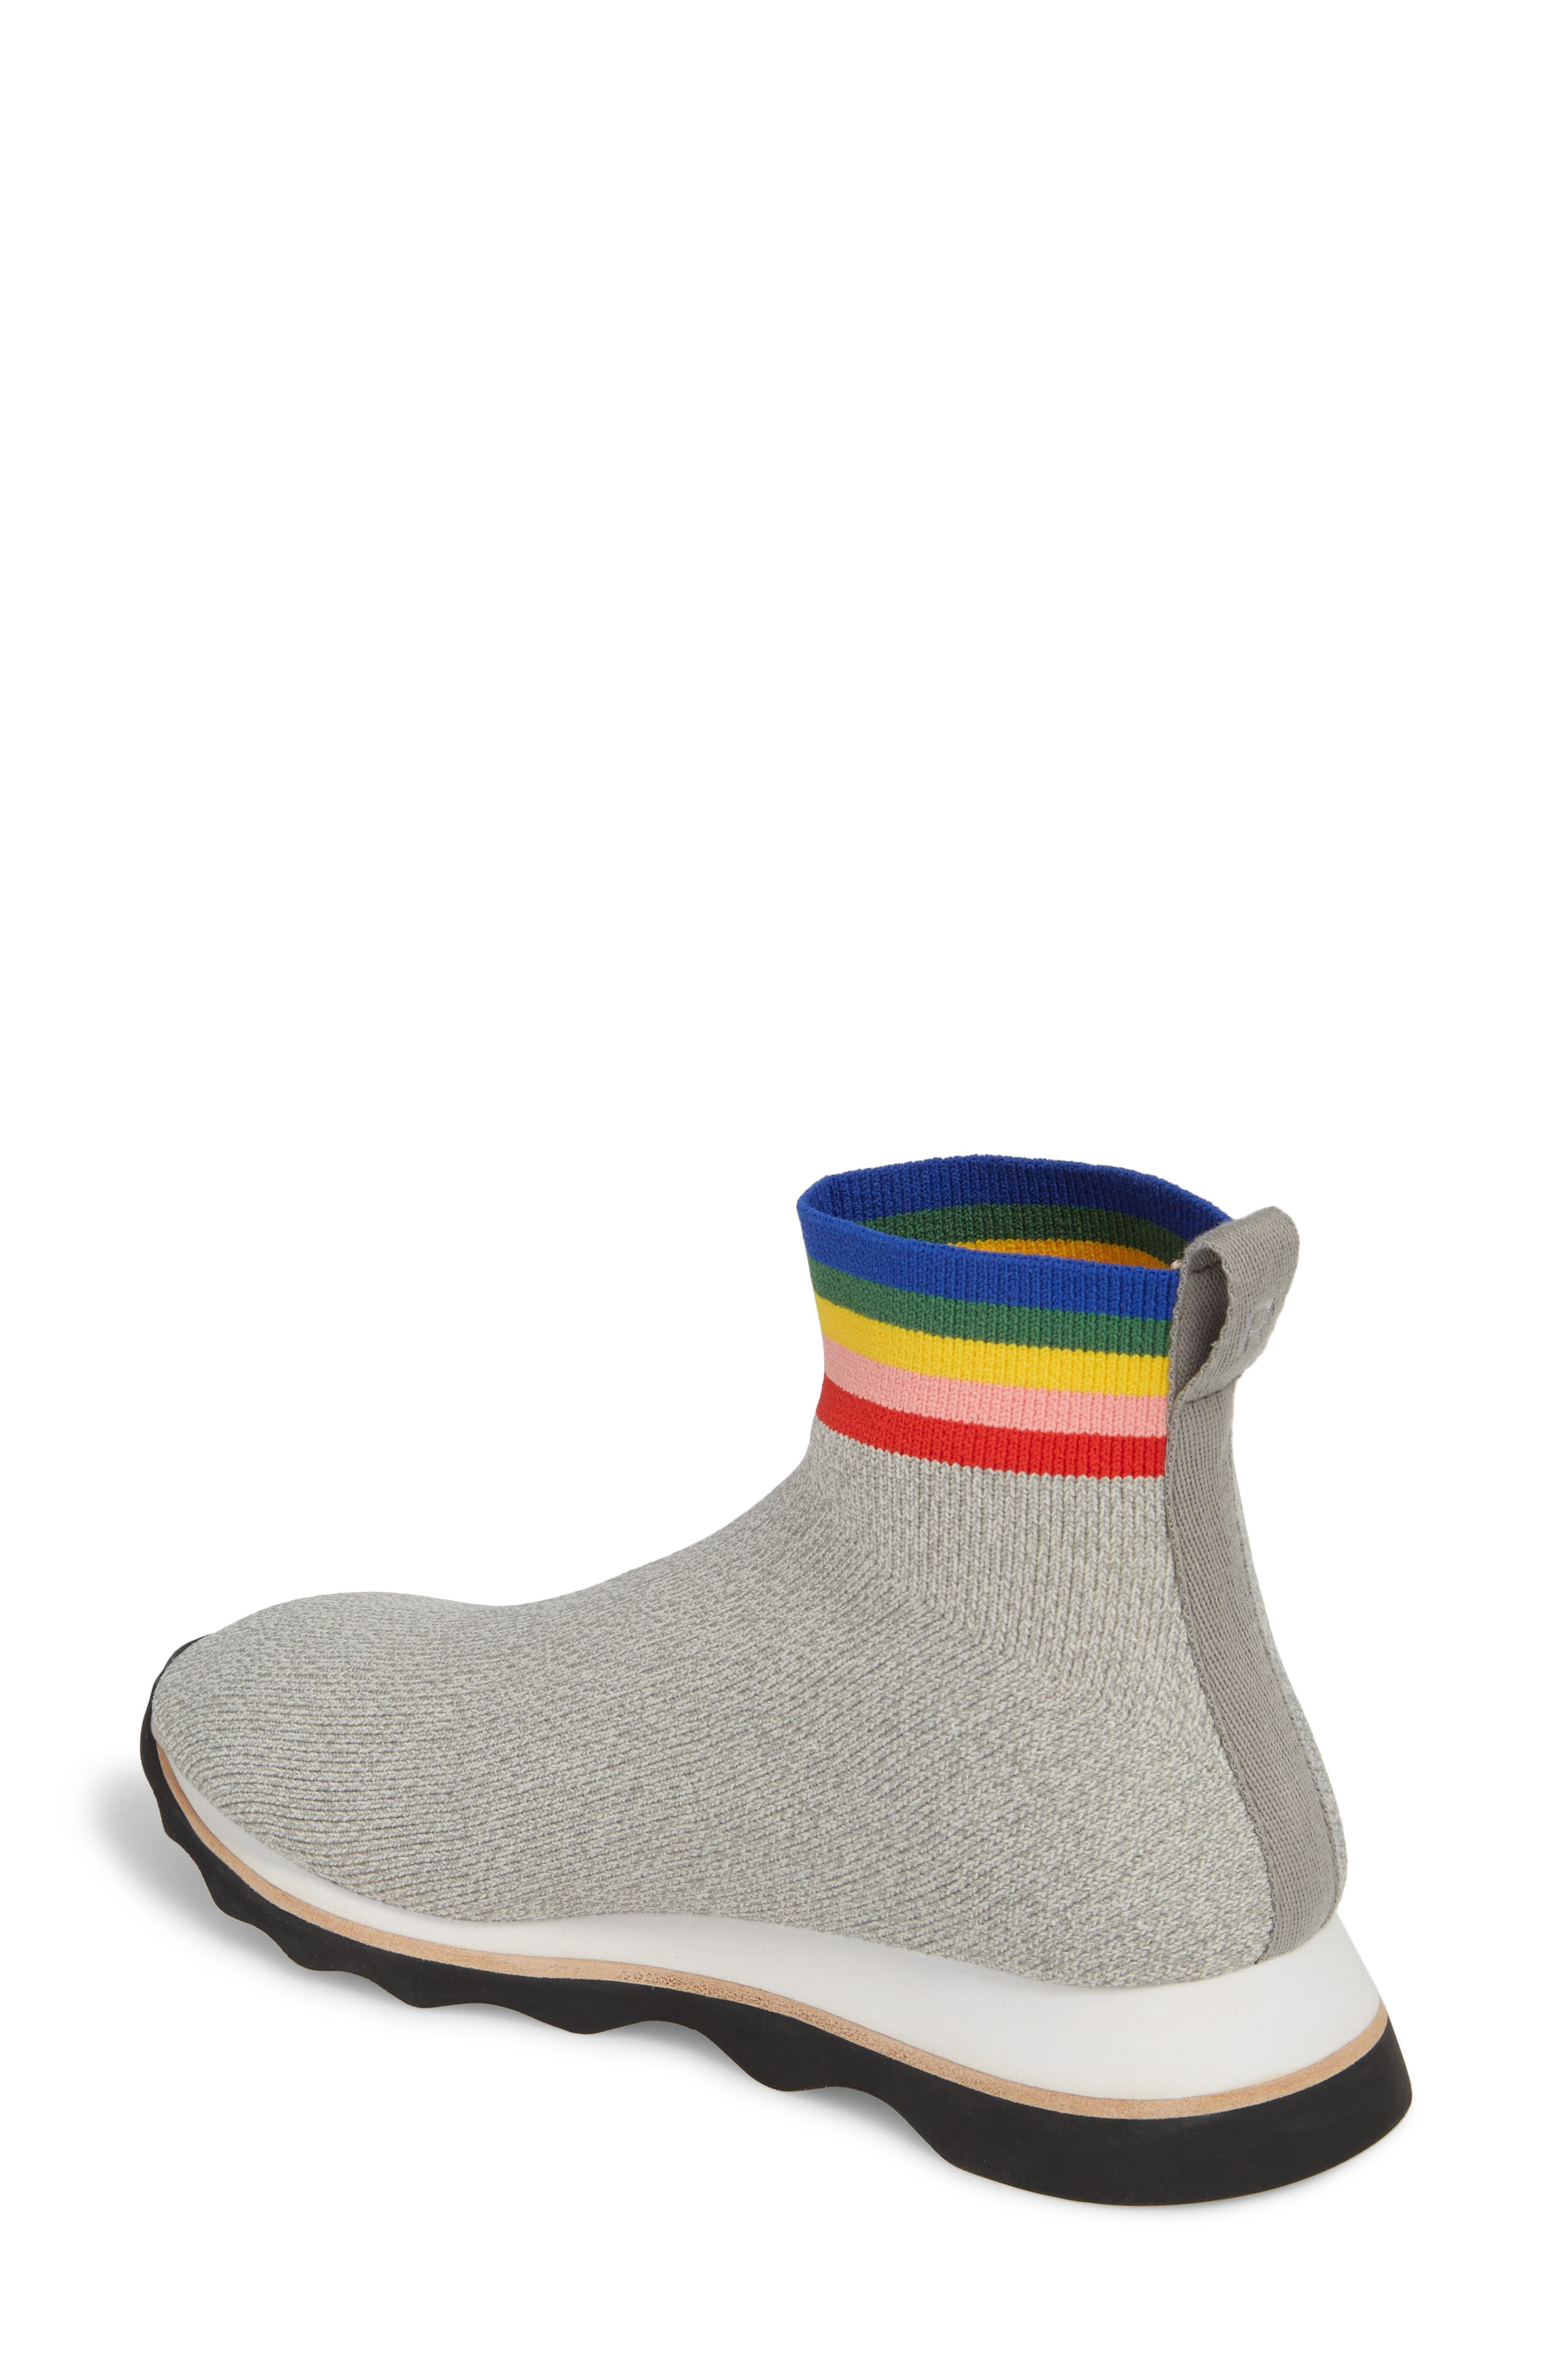 Alternate Image 2  - Loeffler Randall Scout Sock Sneaker (Women)